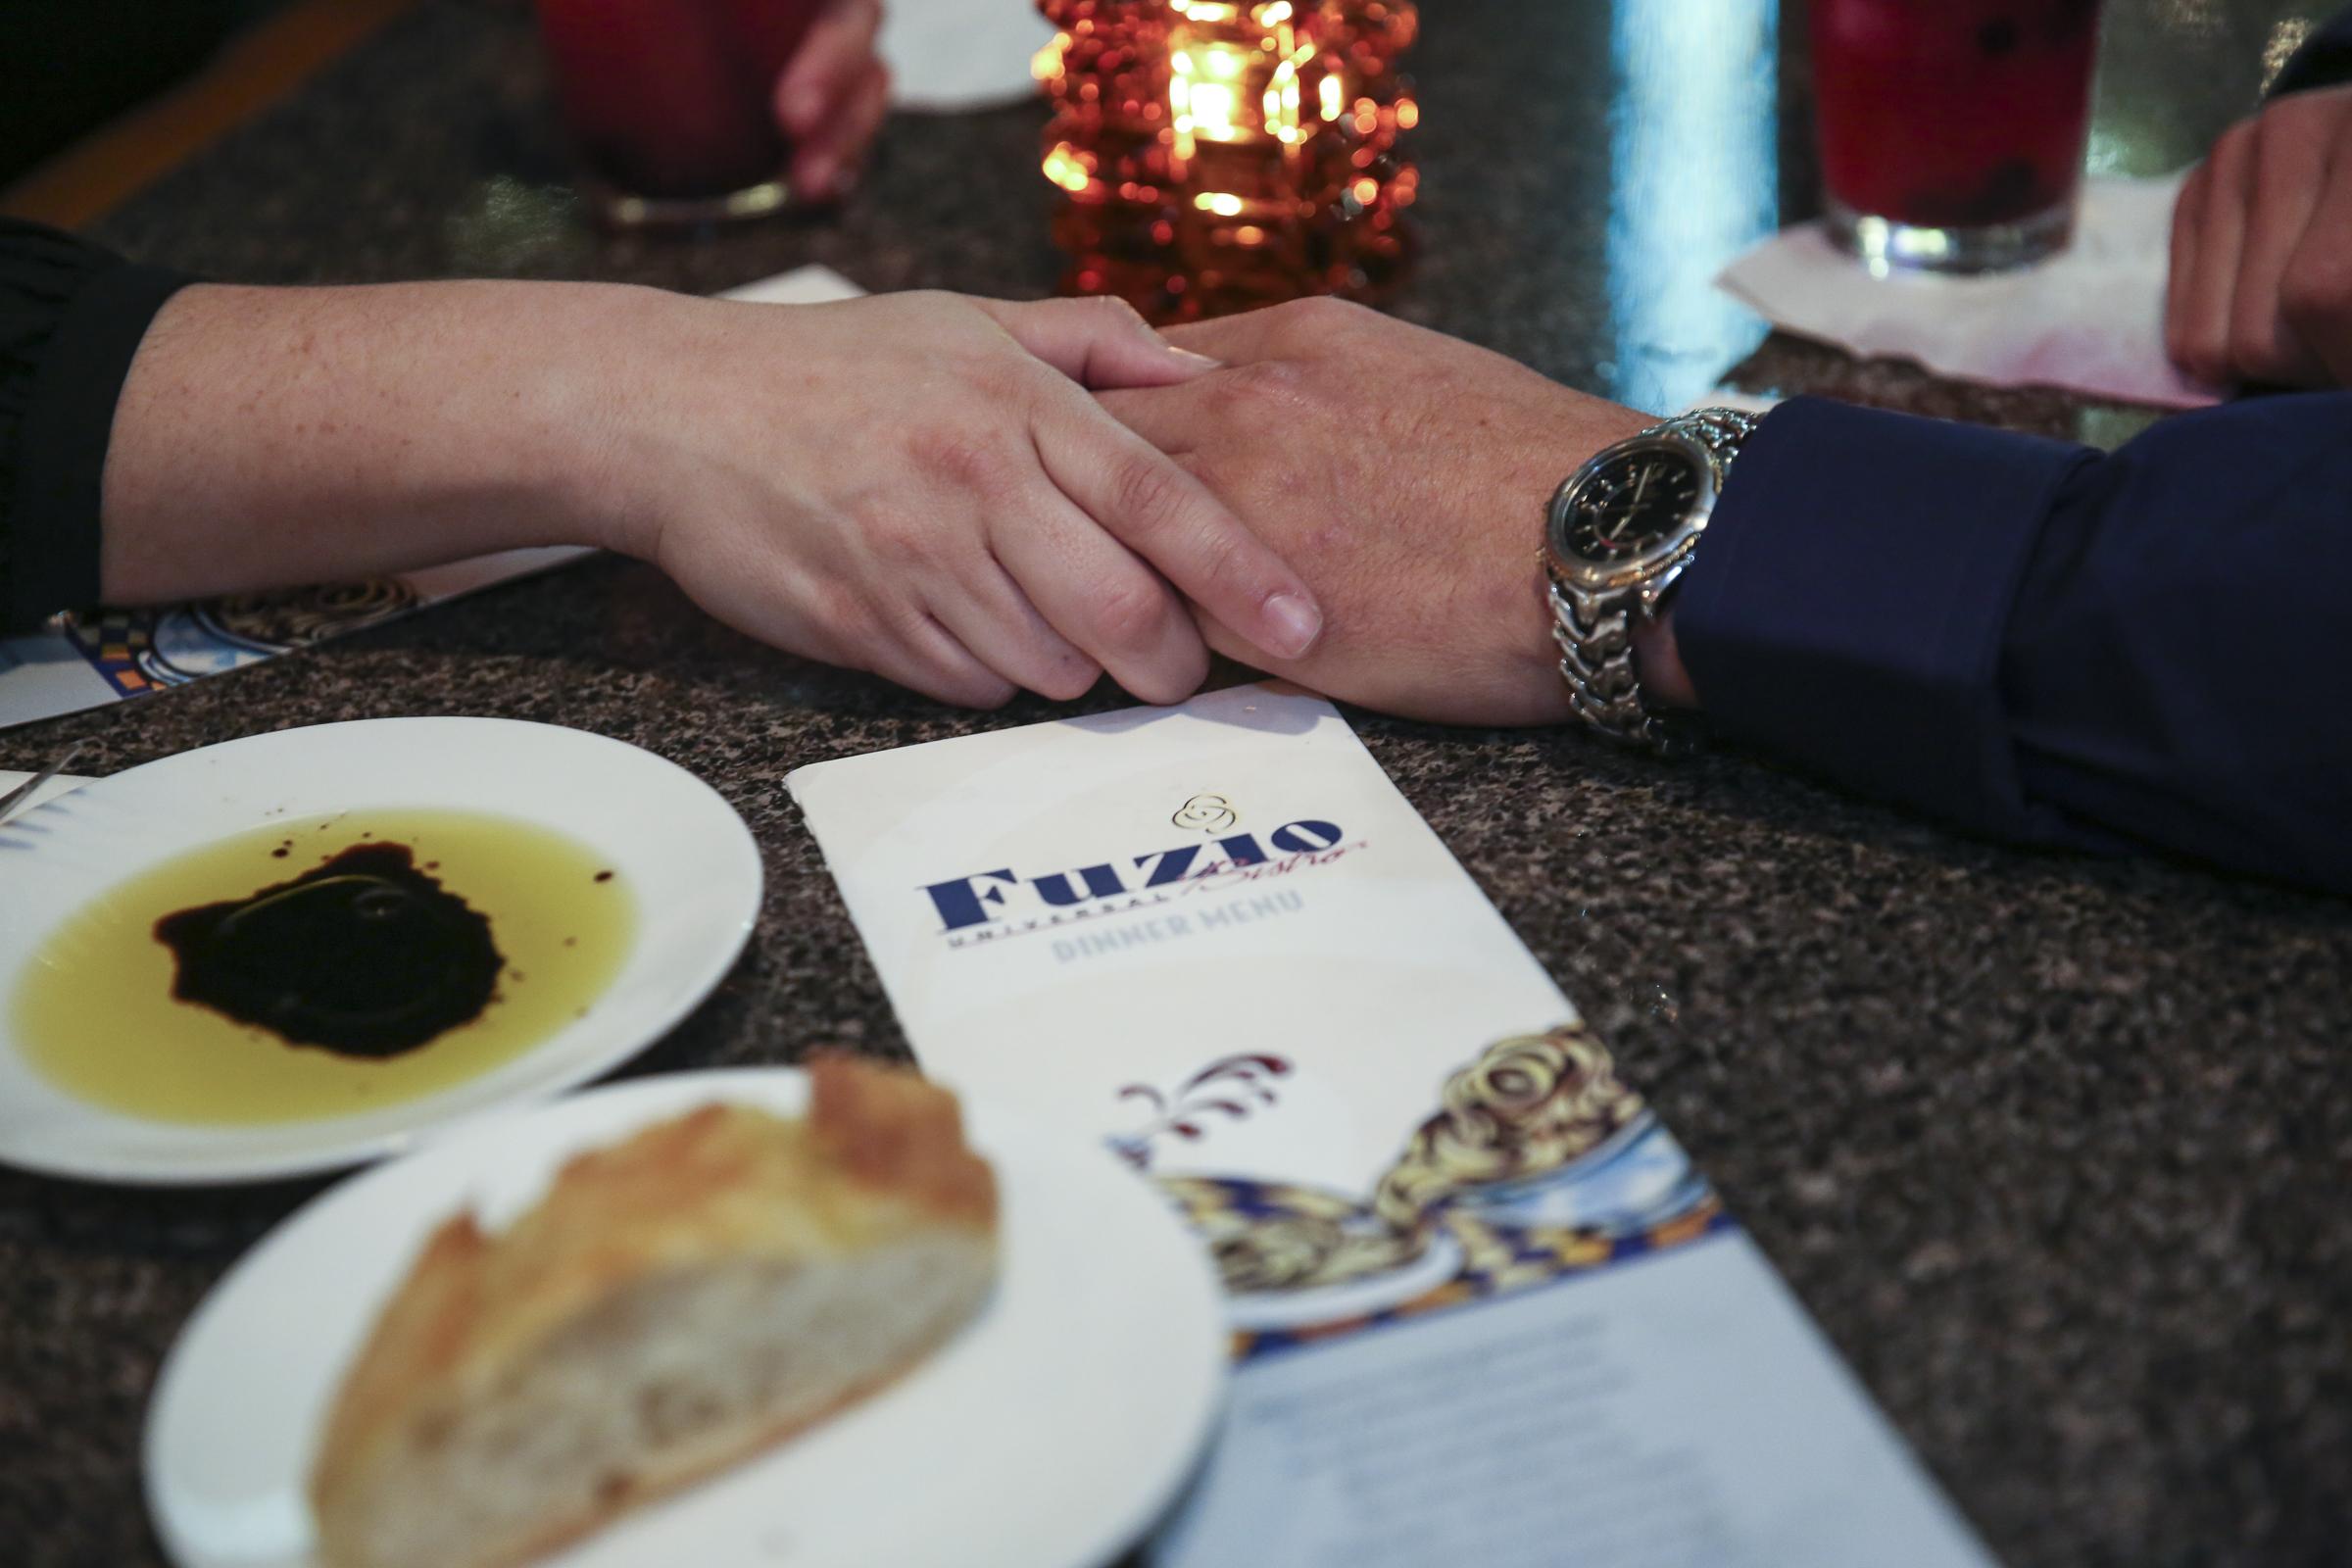 Date Night at Fuizo in Downtown Modesto